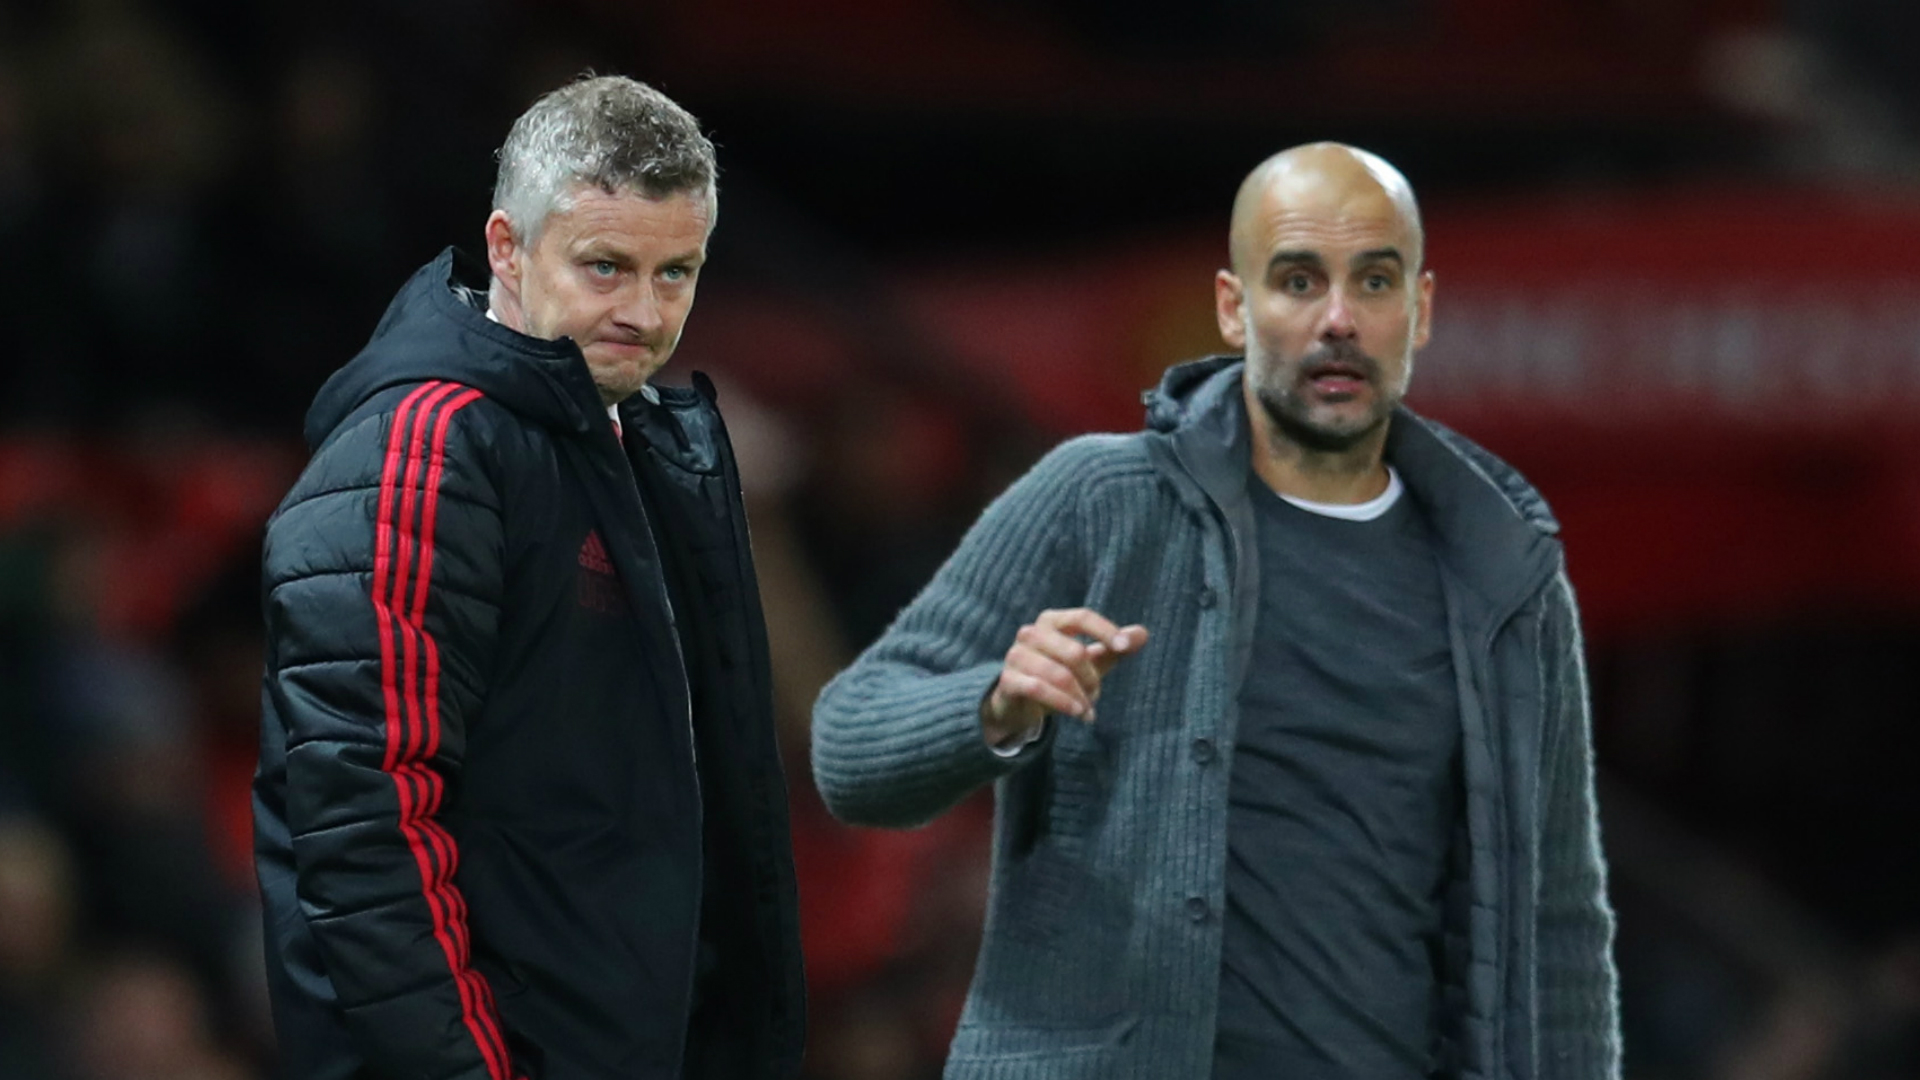 Big Match Focus: Manchester City v Manchester United